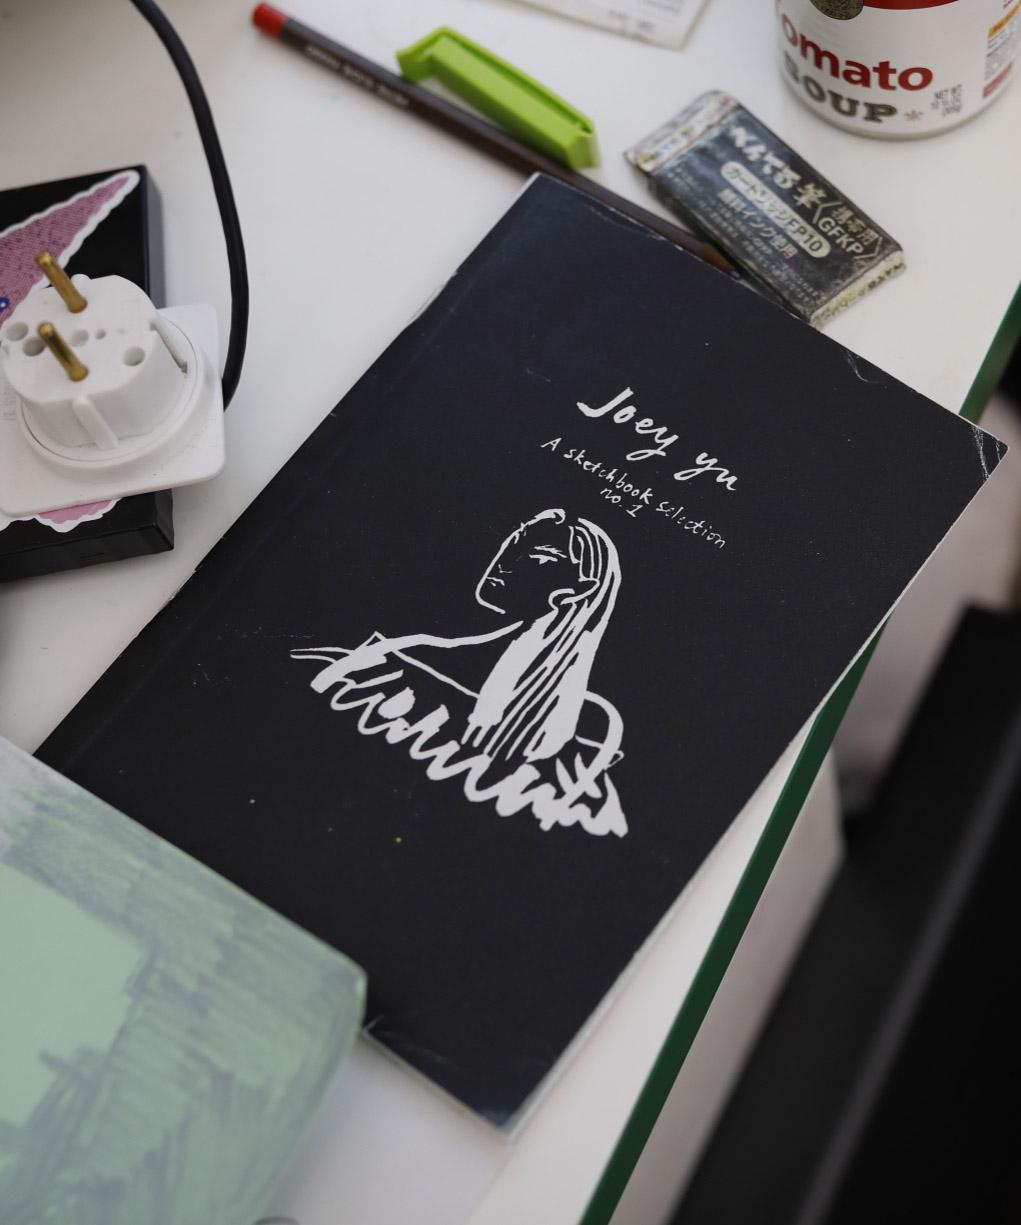 Joey Yu's sketchbook, photographed by Dean Martindale (@deanmartindale)